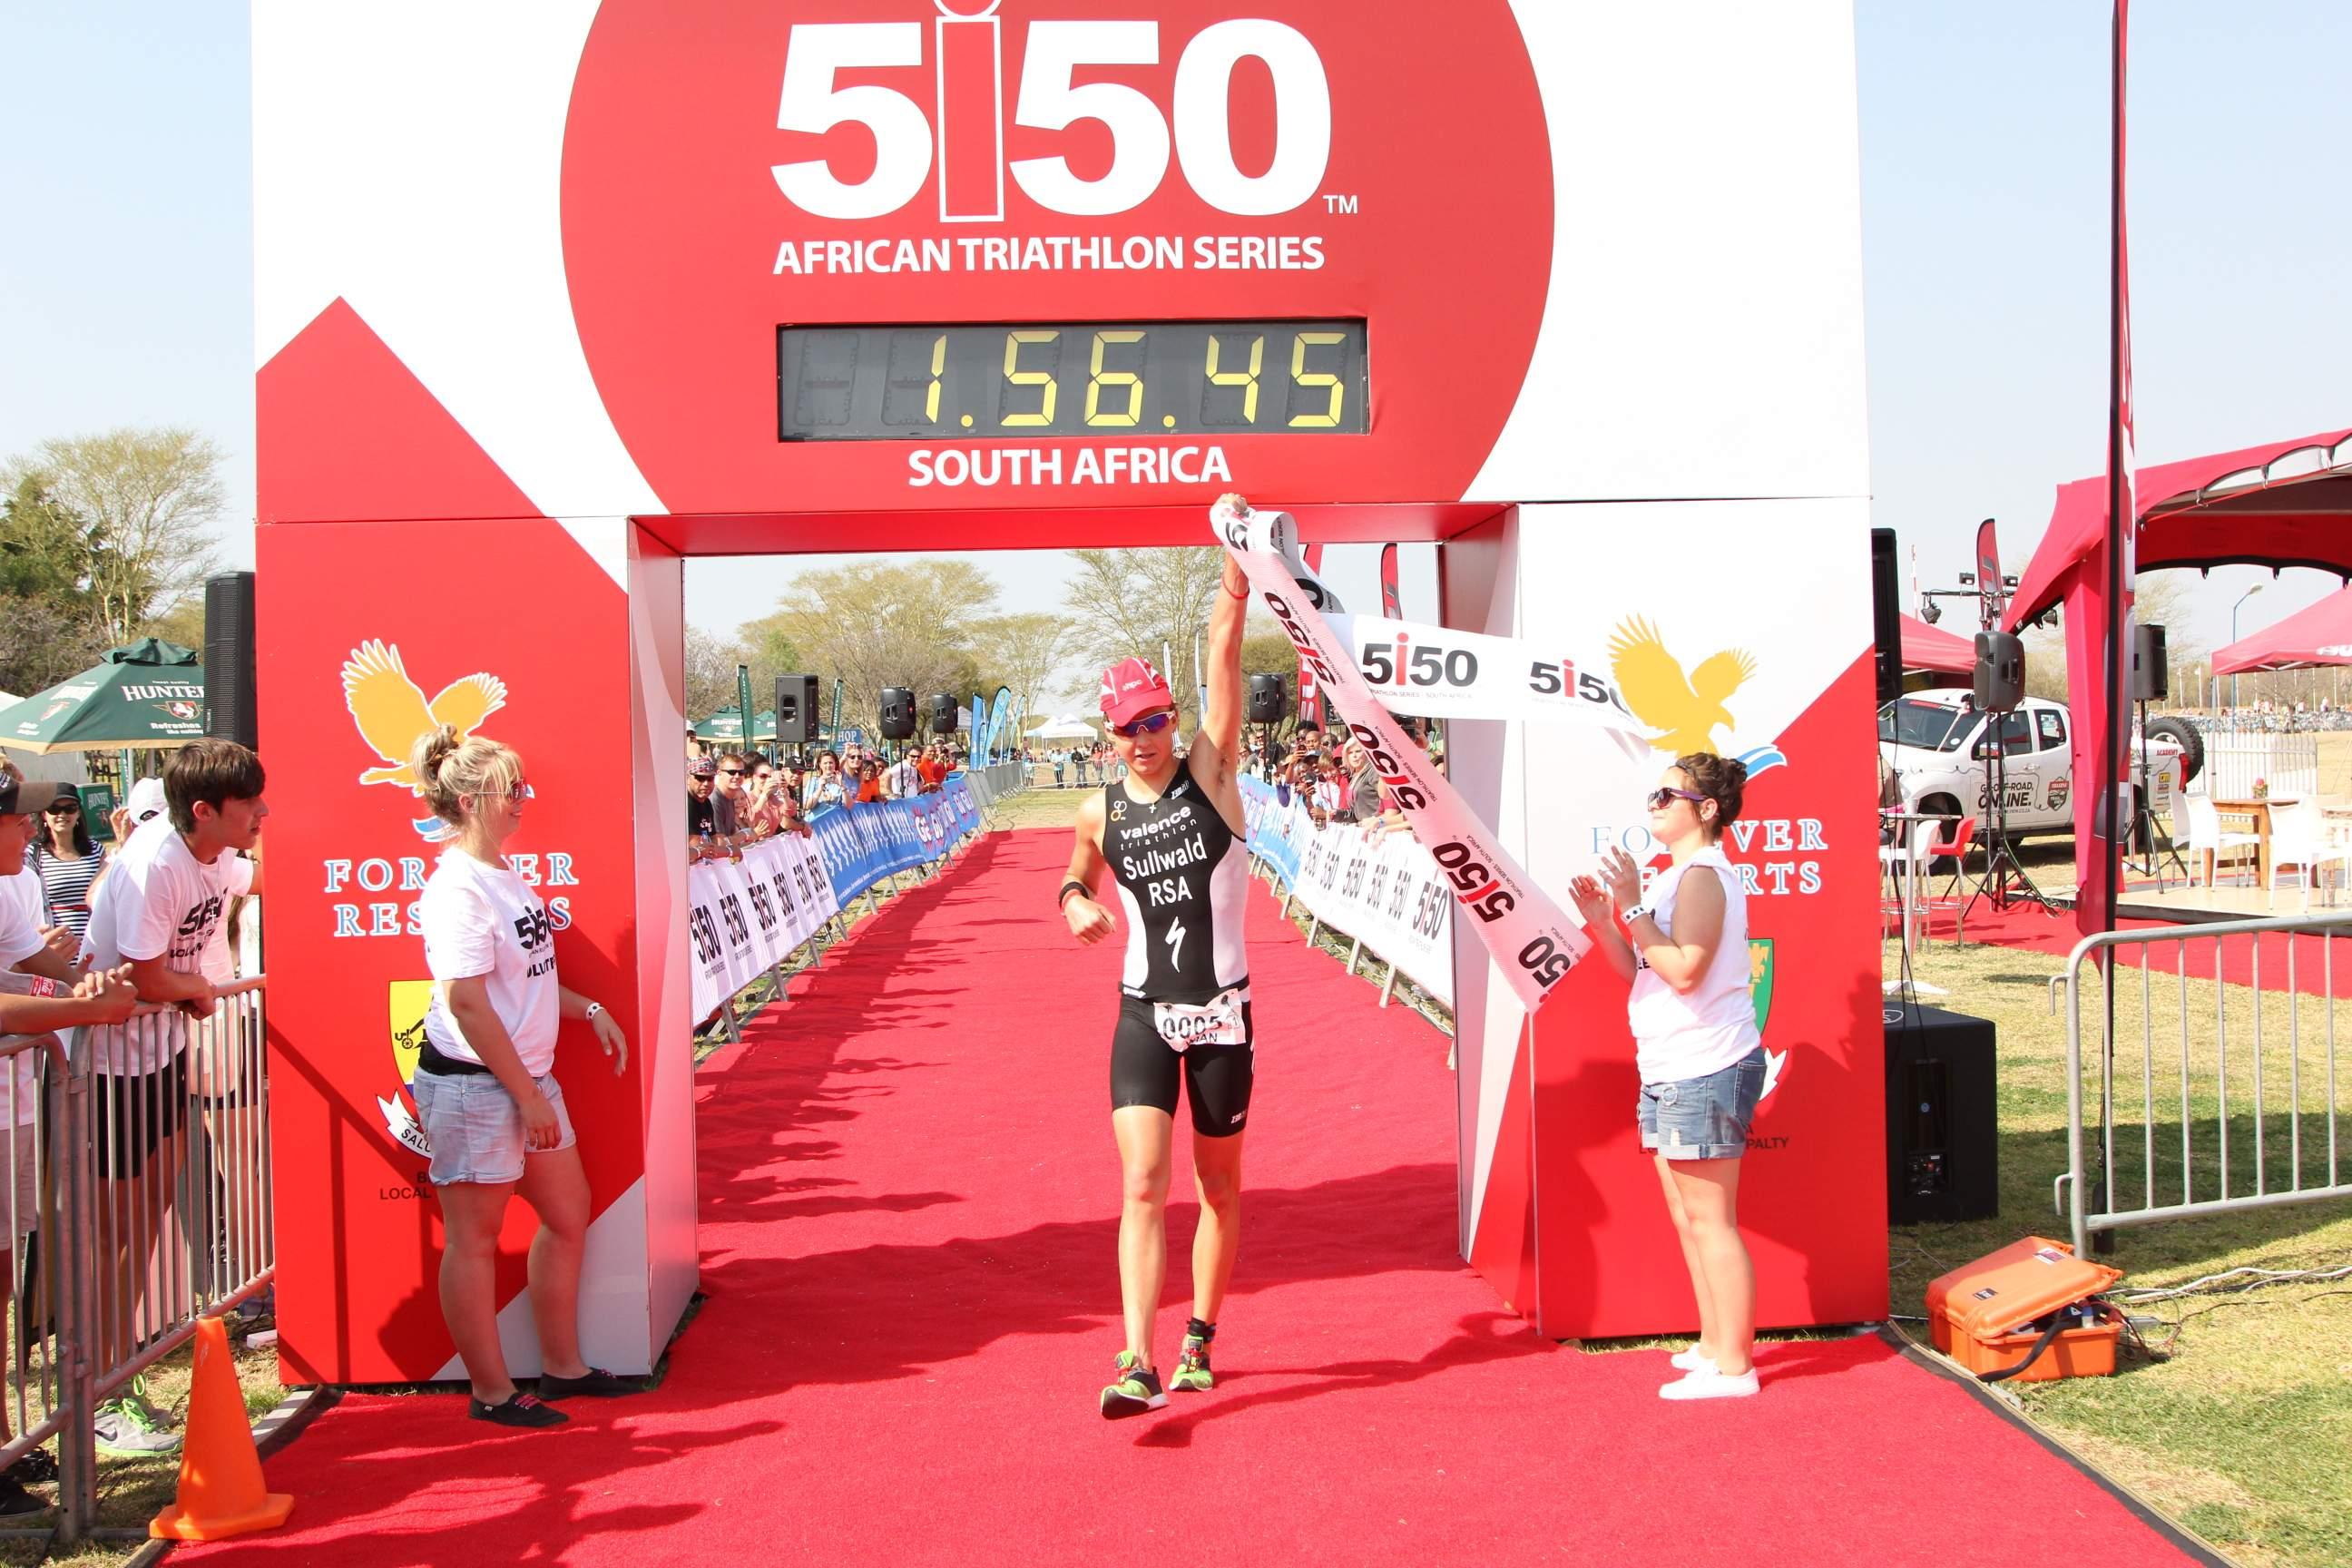 triathlon 5150